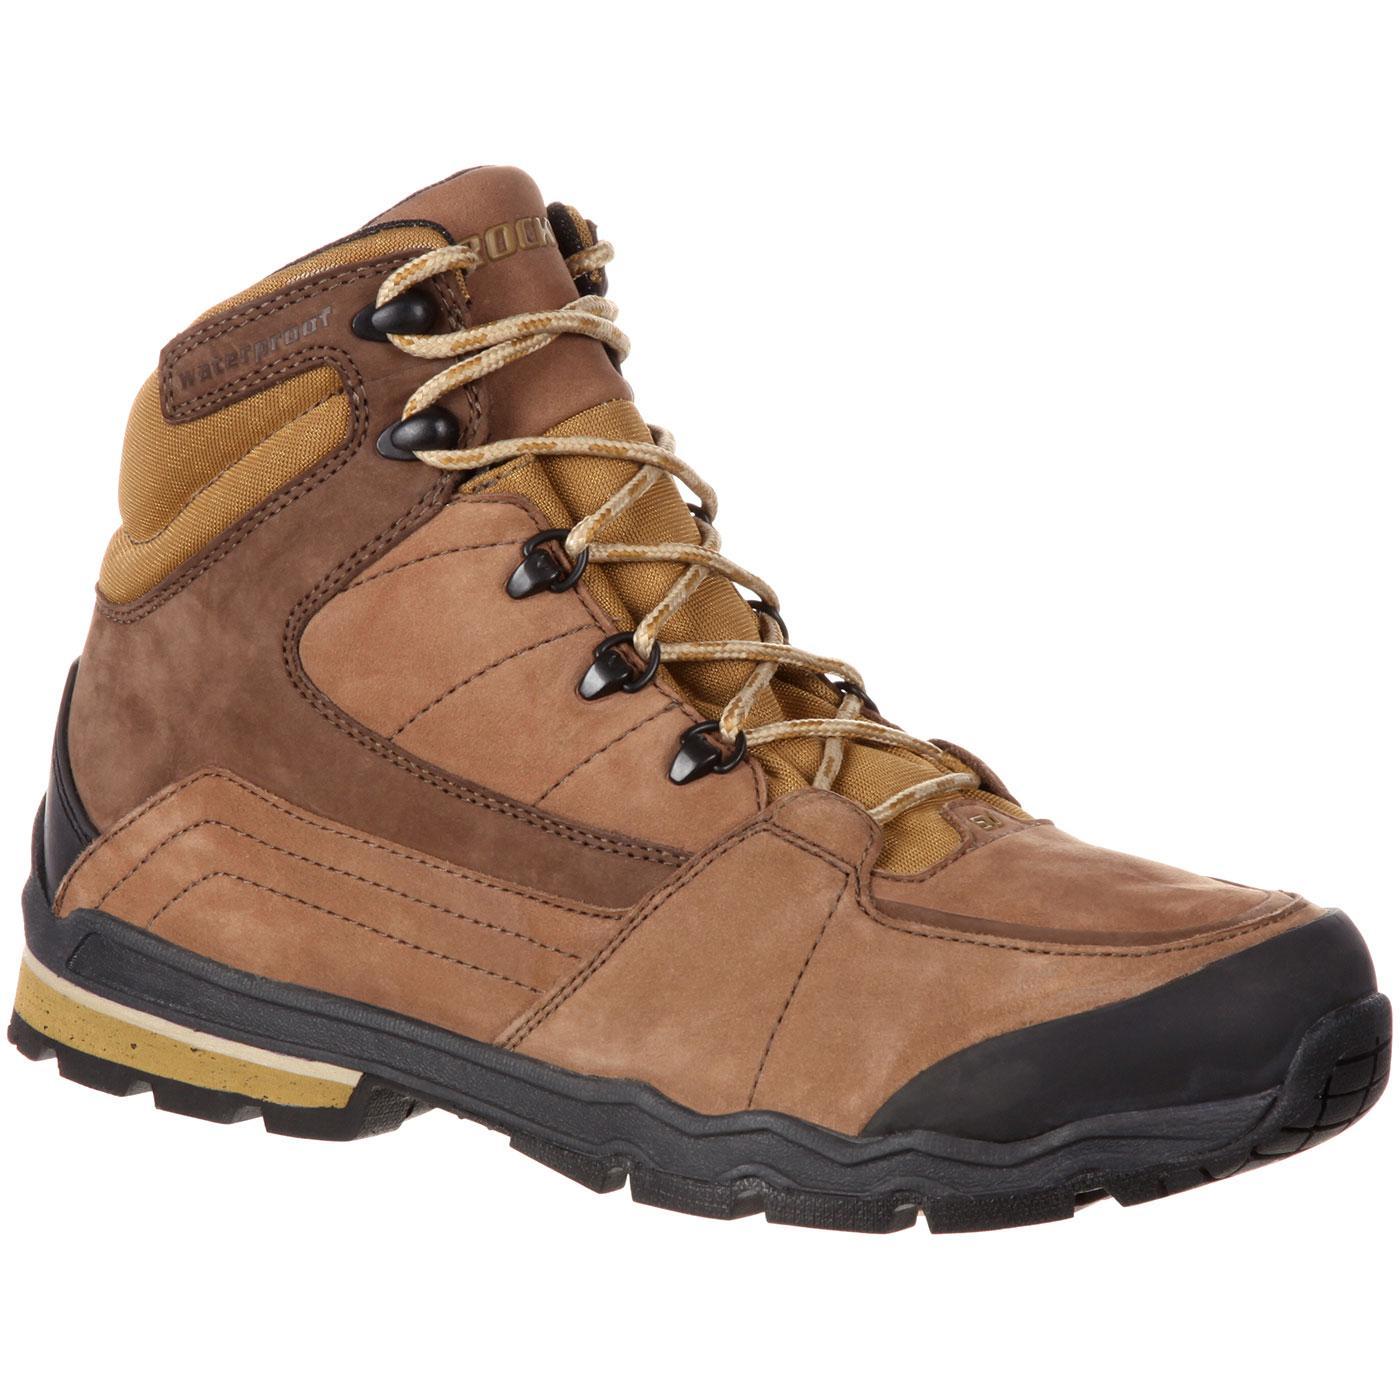 "Men's 6"" S2V Extreme Waterproof Hiker-RKE0037"